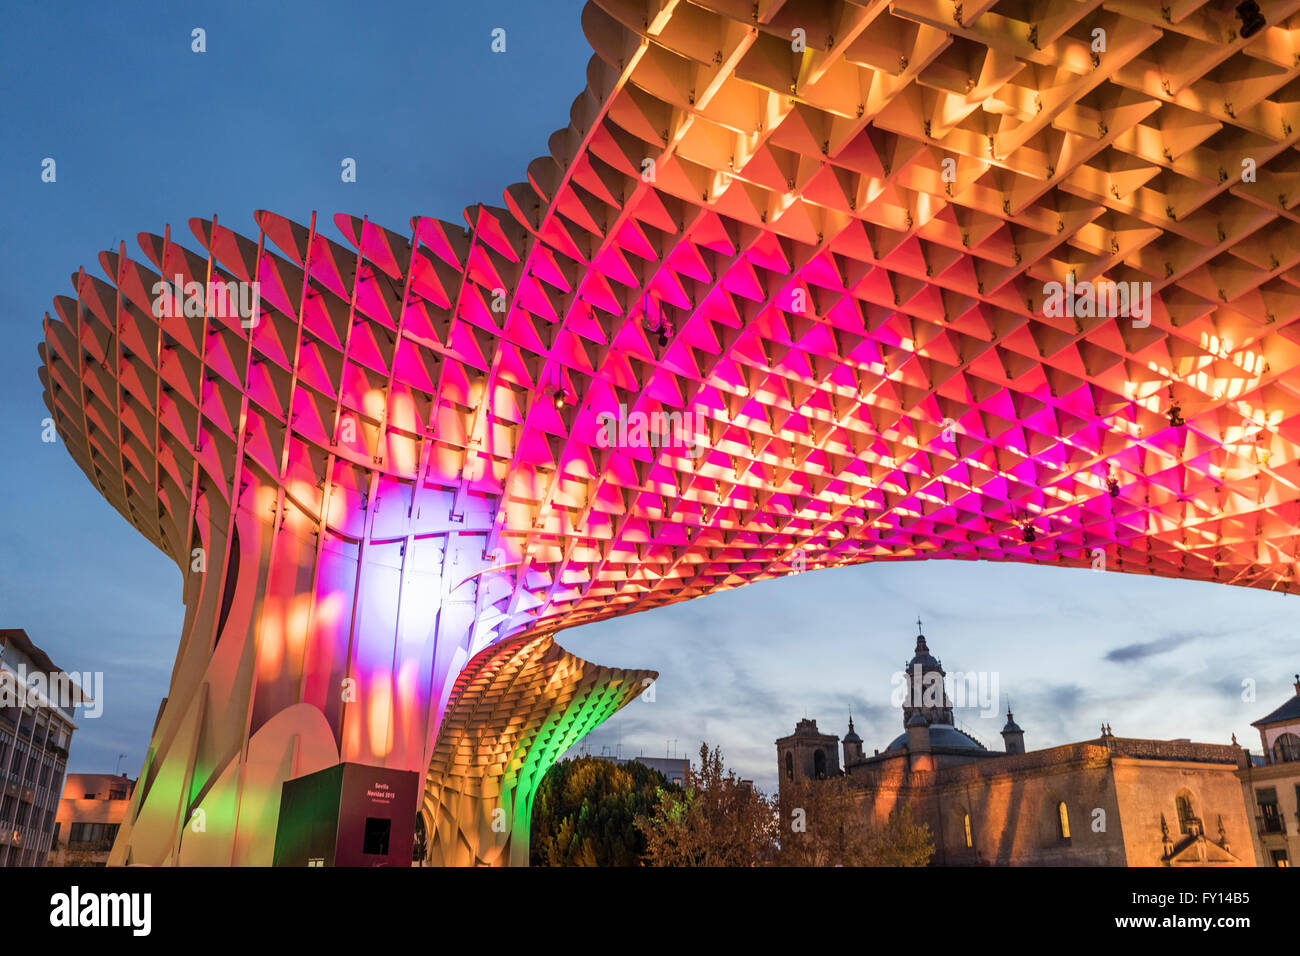 Metropol Parasol at the Plaza de la Encarnacion in Seville, J. Mayer Hermann architects, bonded timber with polyurethane - Stock Image